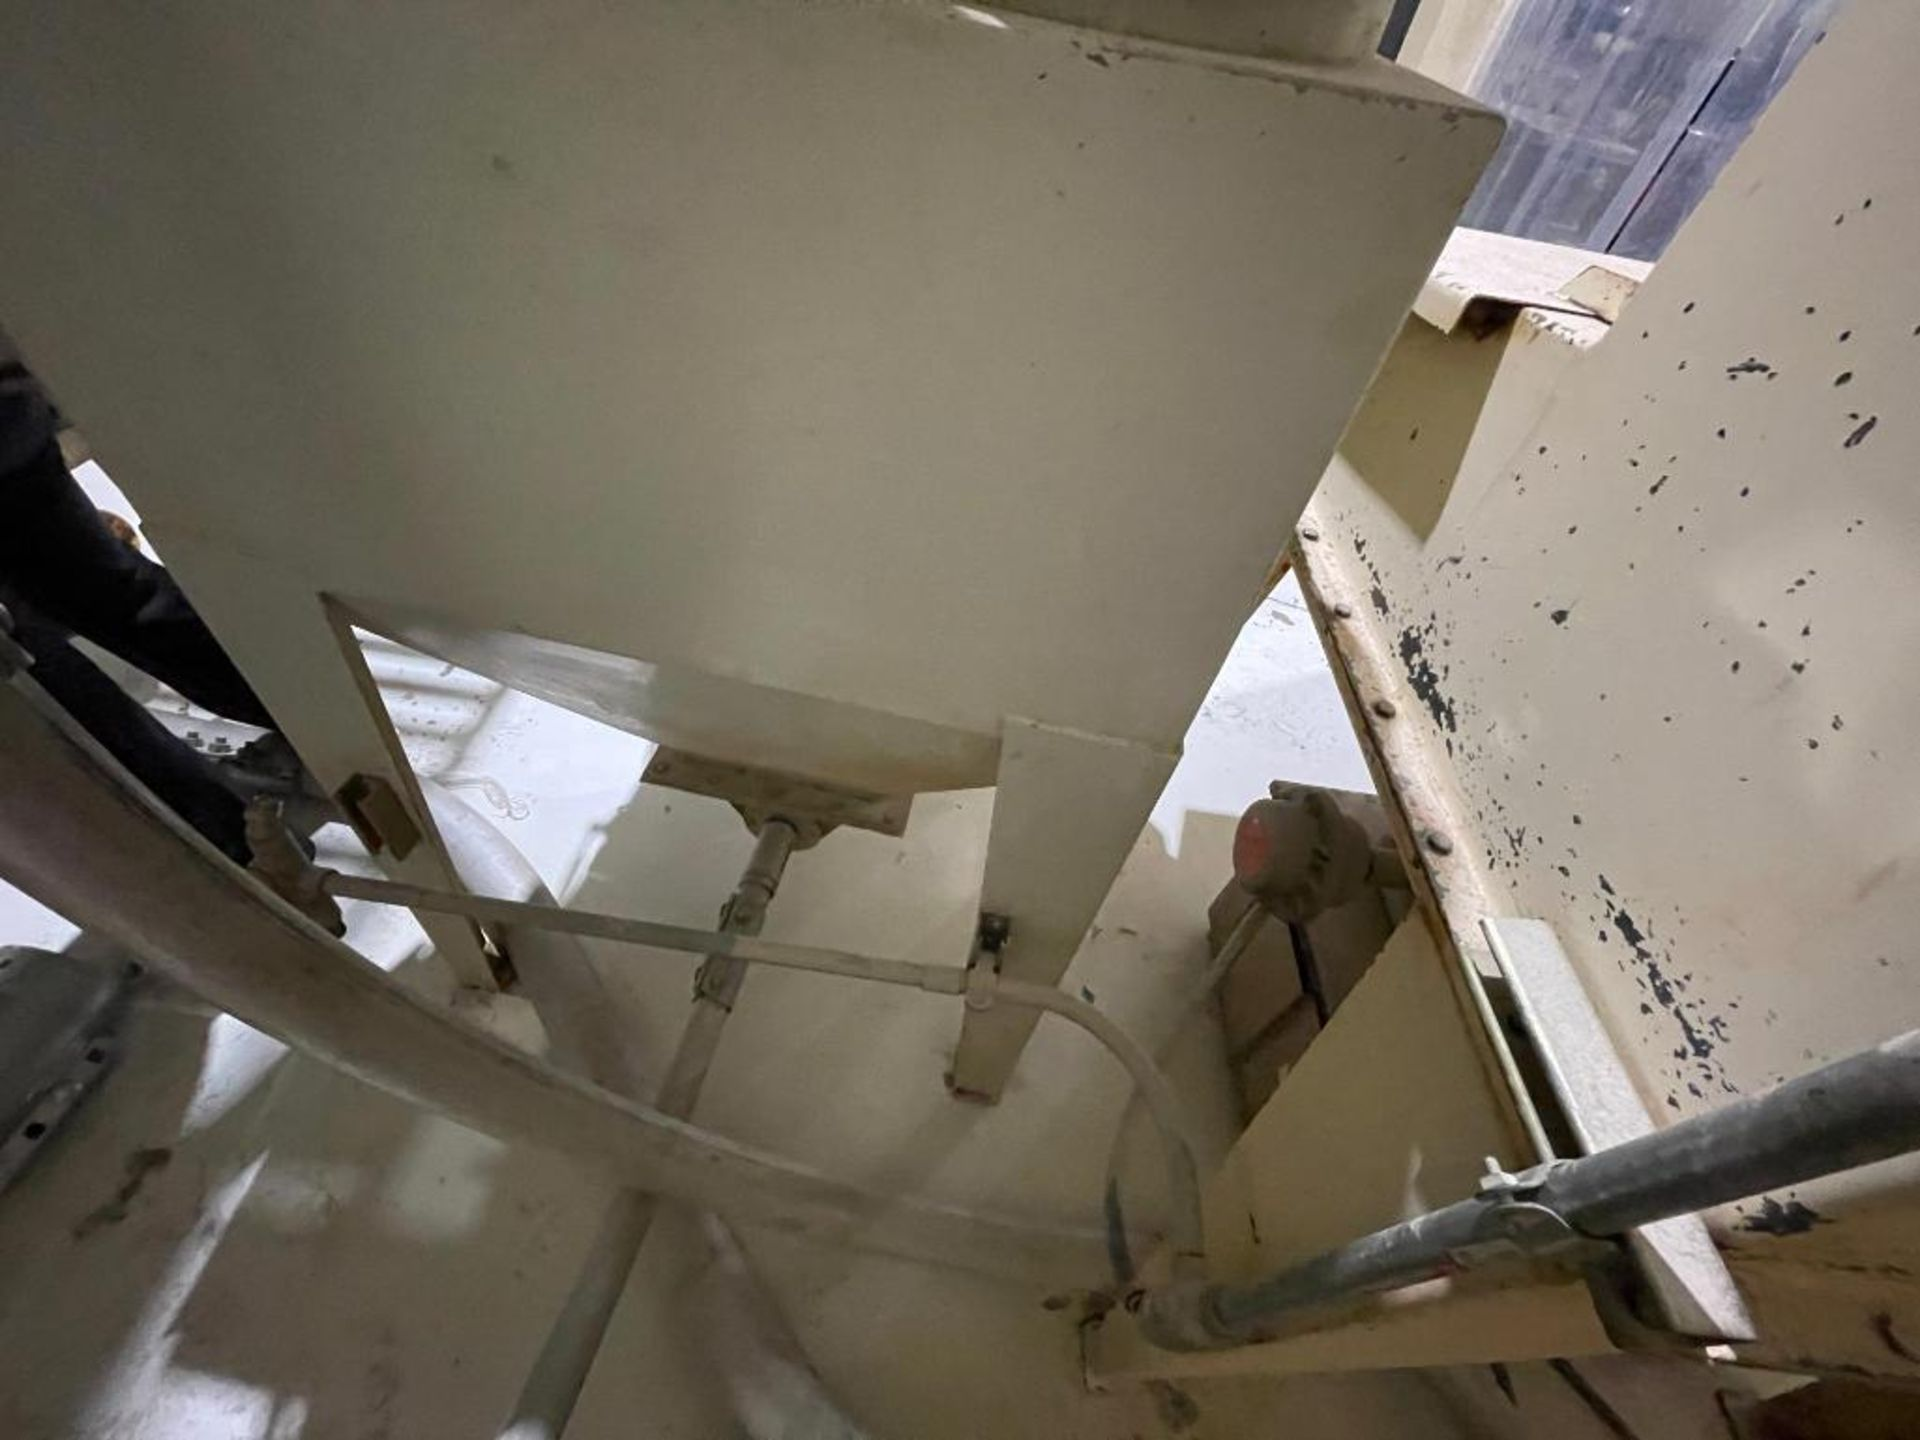 K-Tron dry ingredients dump station - Image 17 of 18